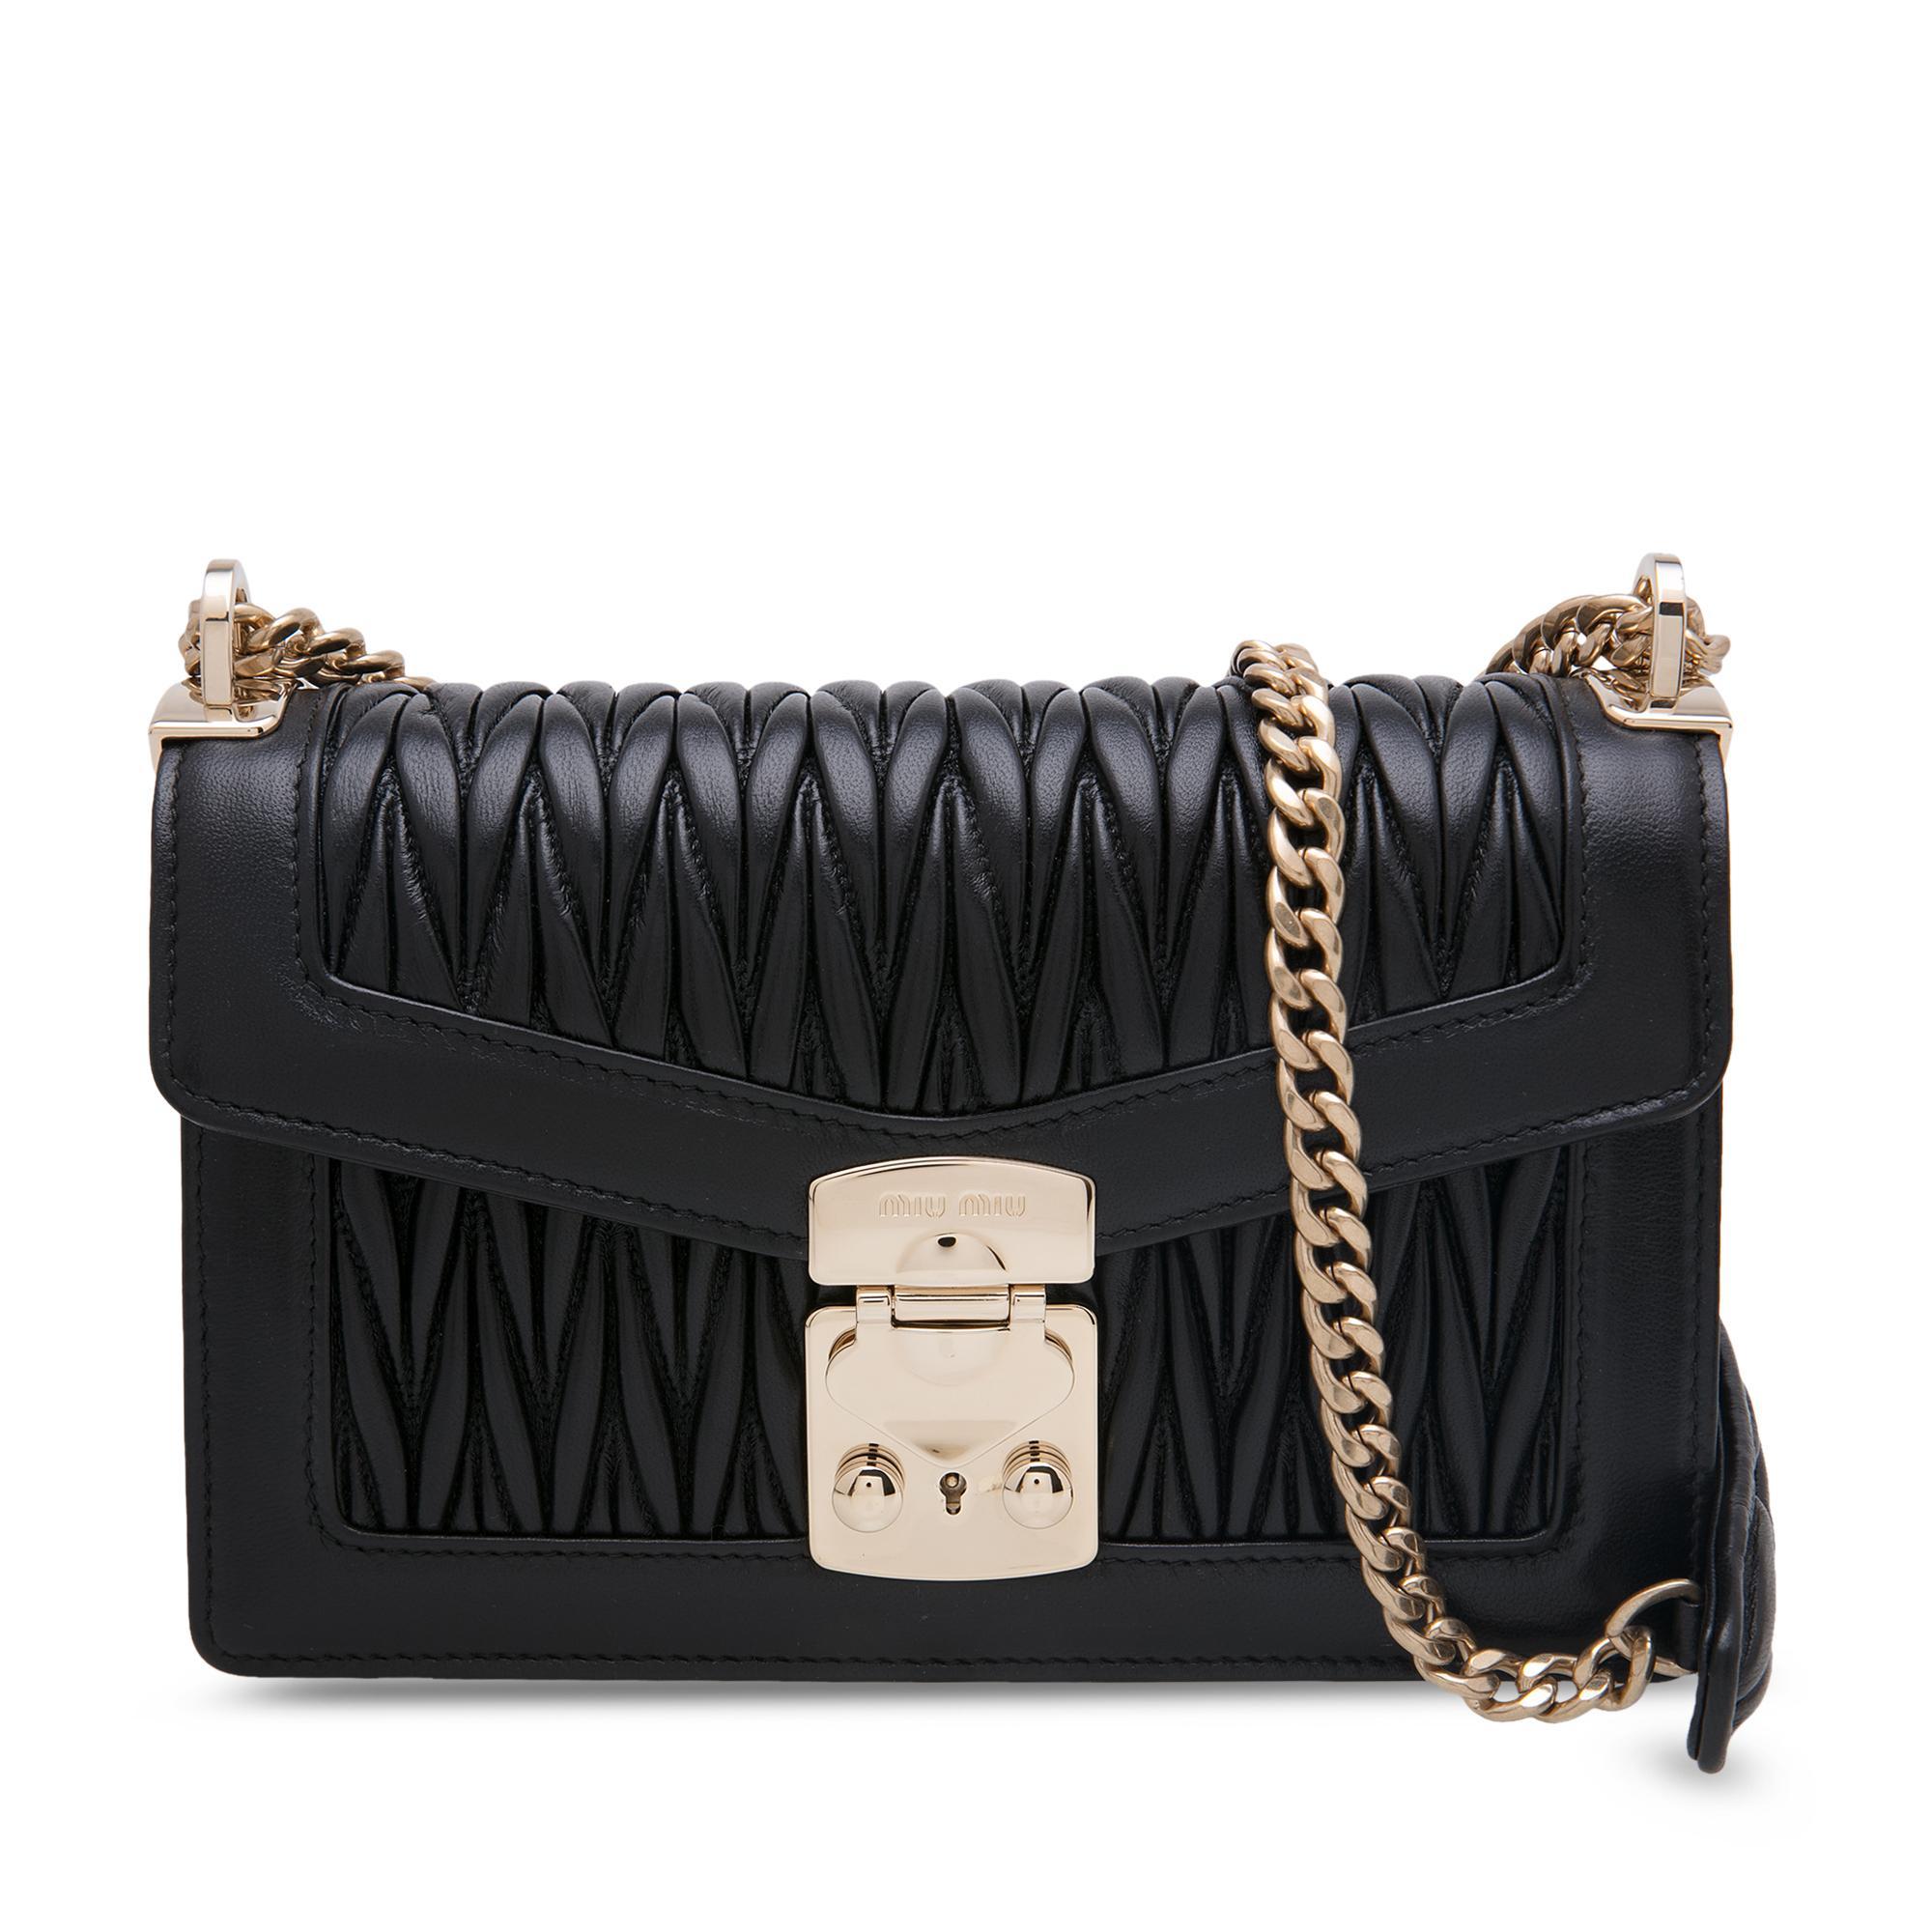 Miu Confidential leather shoulder bag